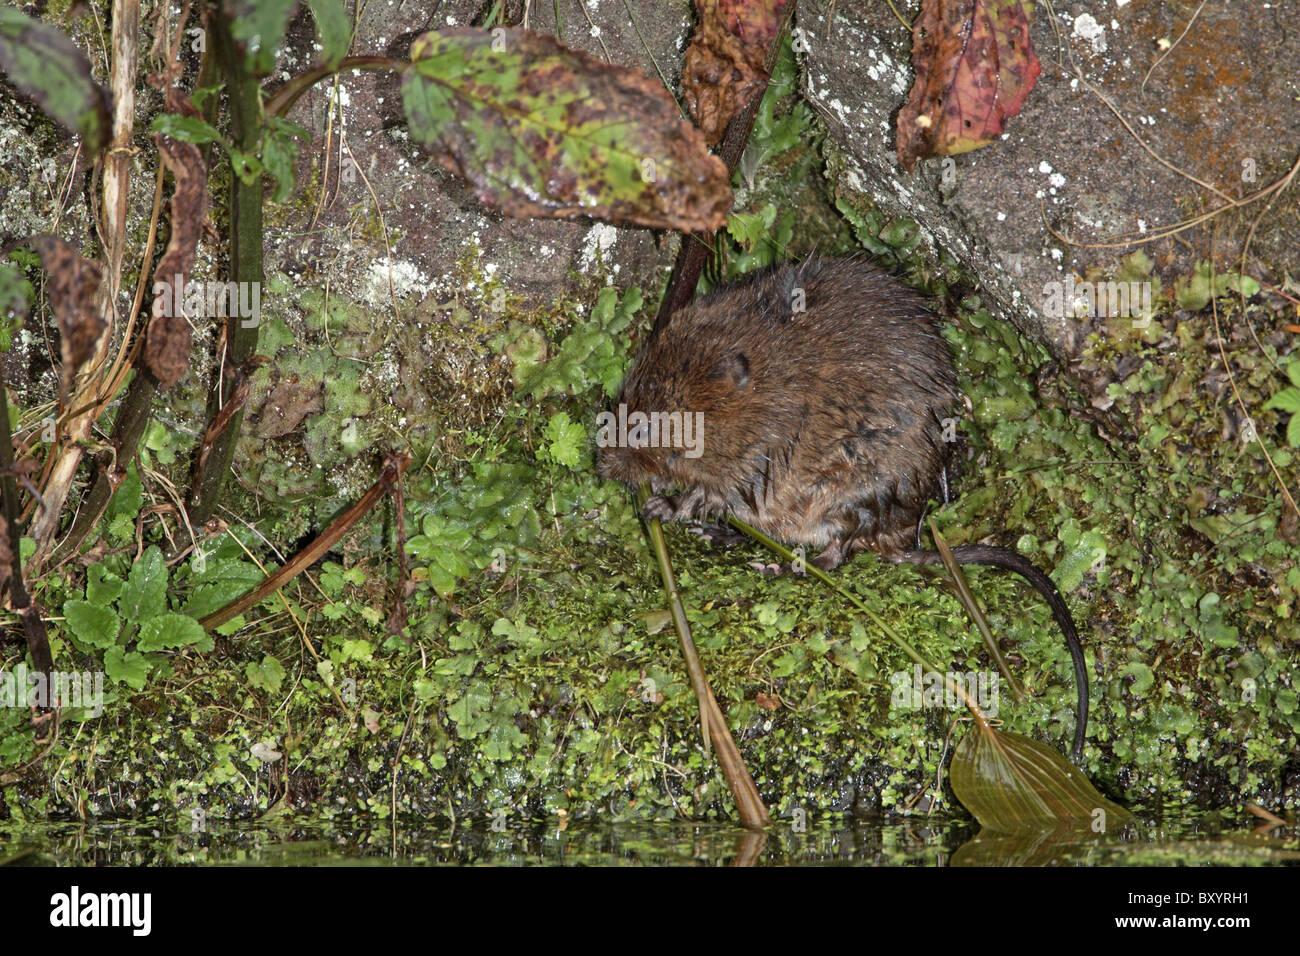 Water Vole, Arvicola amphibius eating reed, Derbyshire - Stock Image